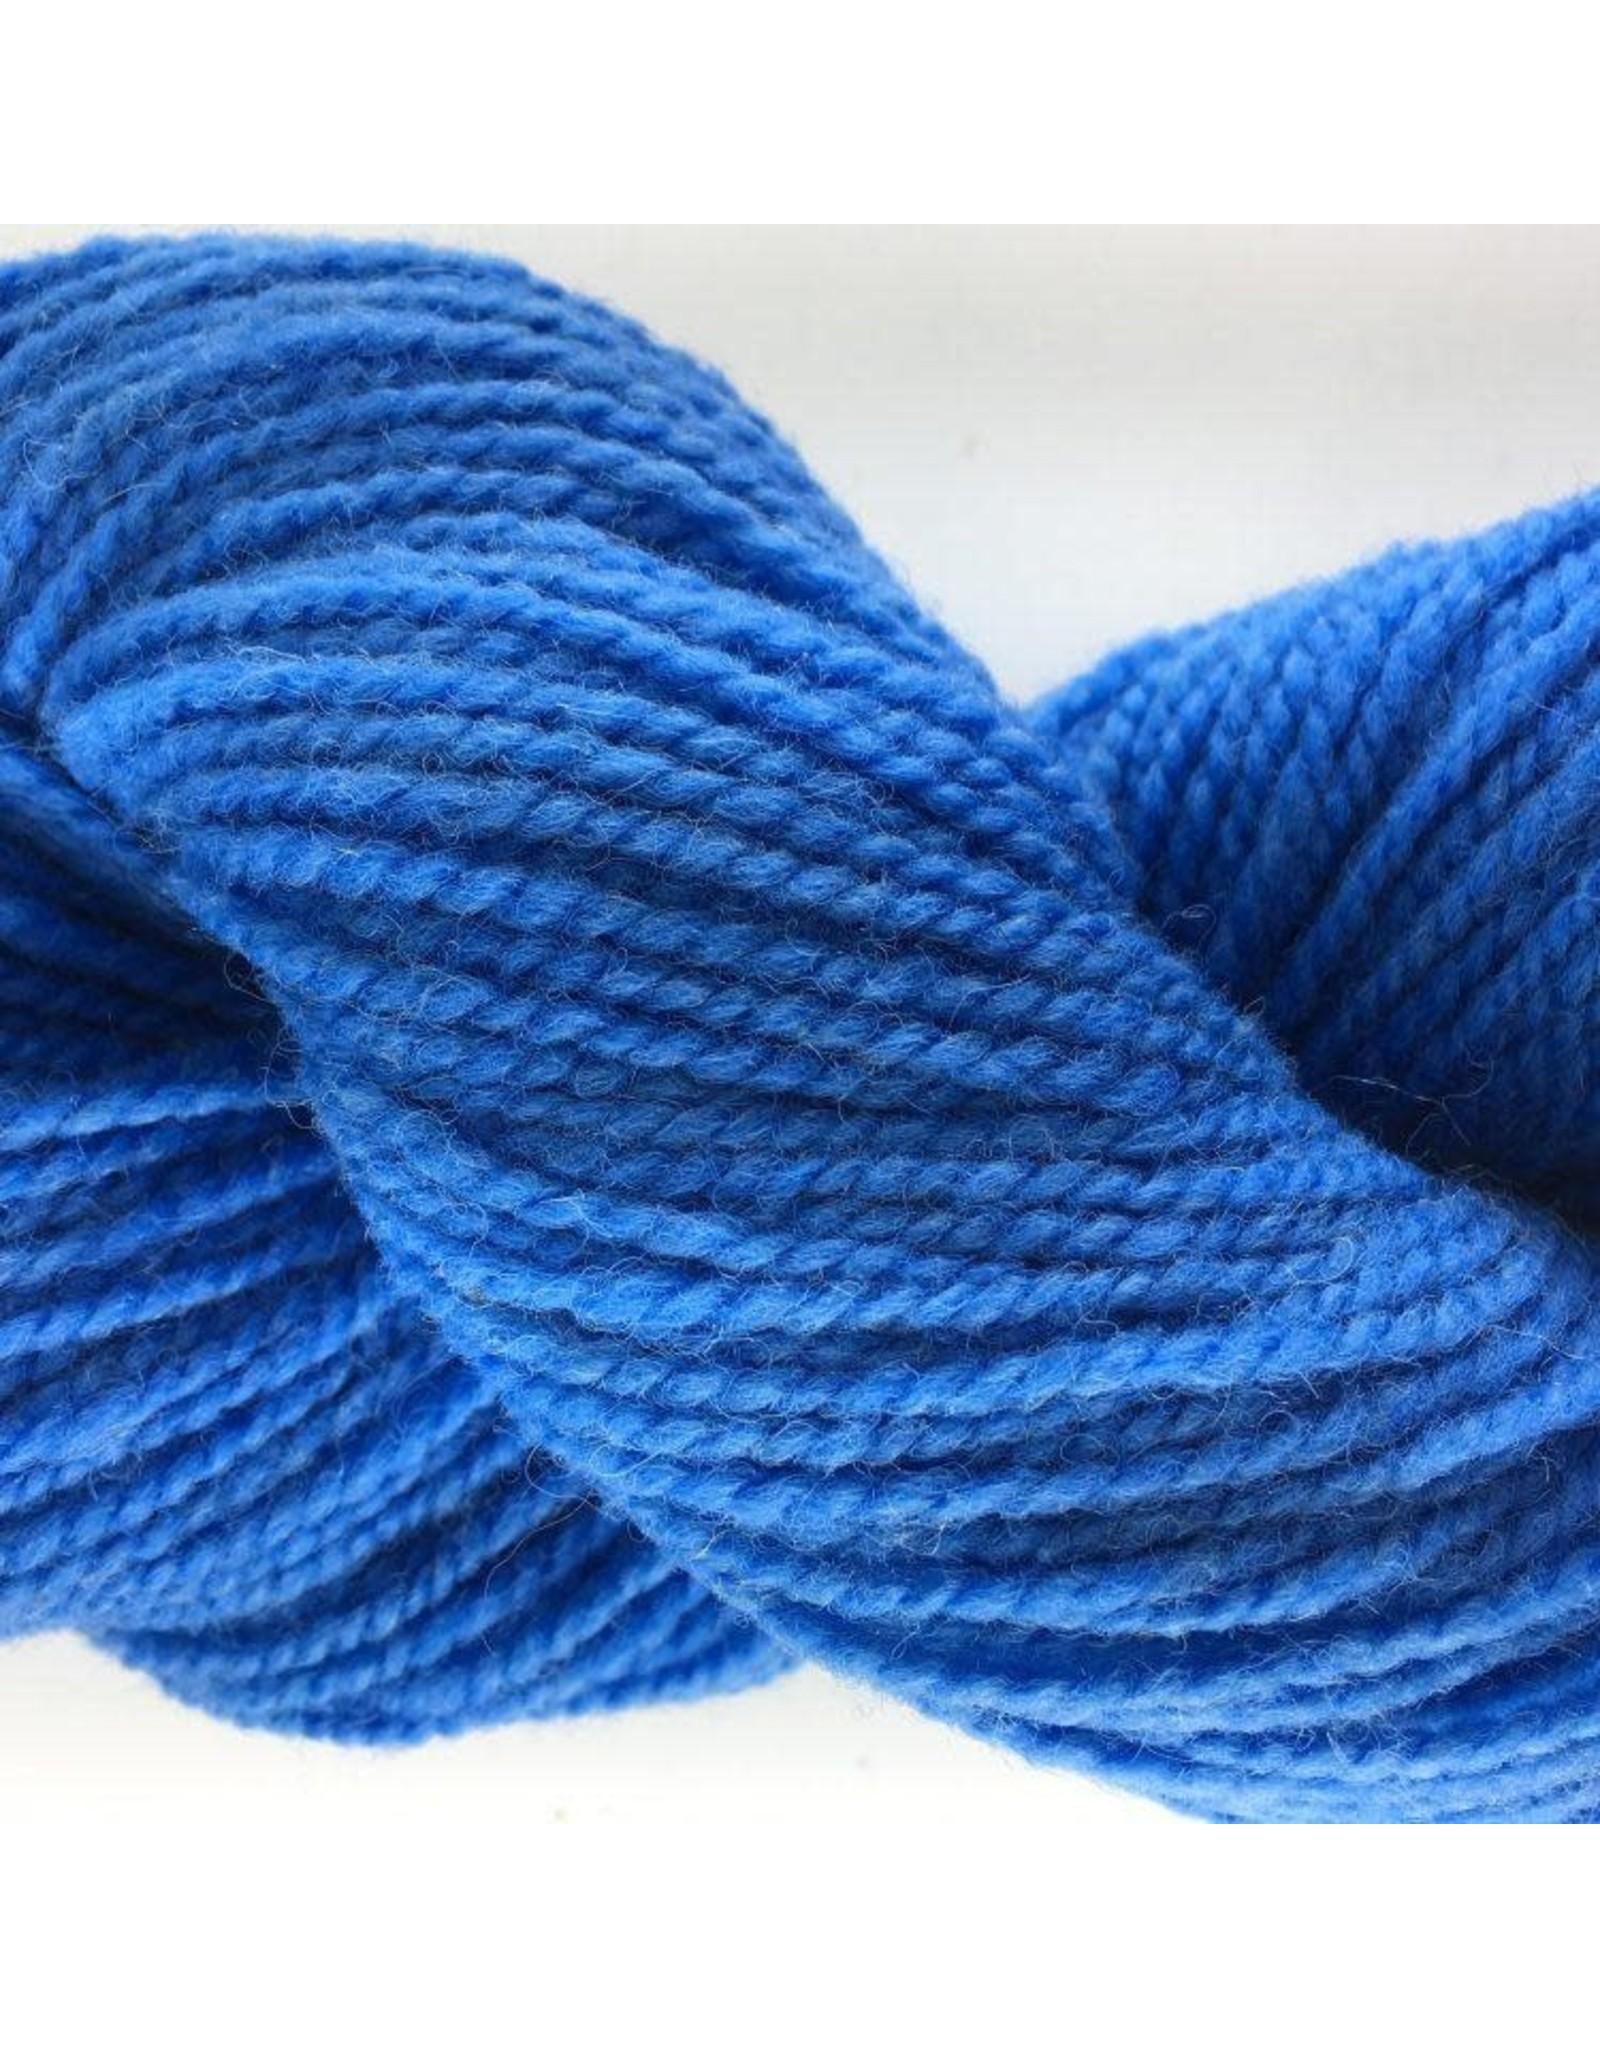 Briggs & Little Heritage 2 Ply - Light Blue